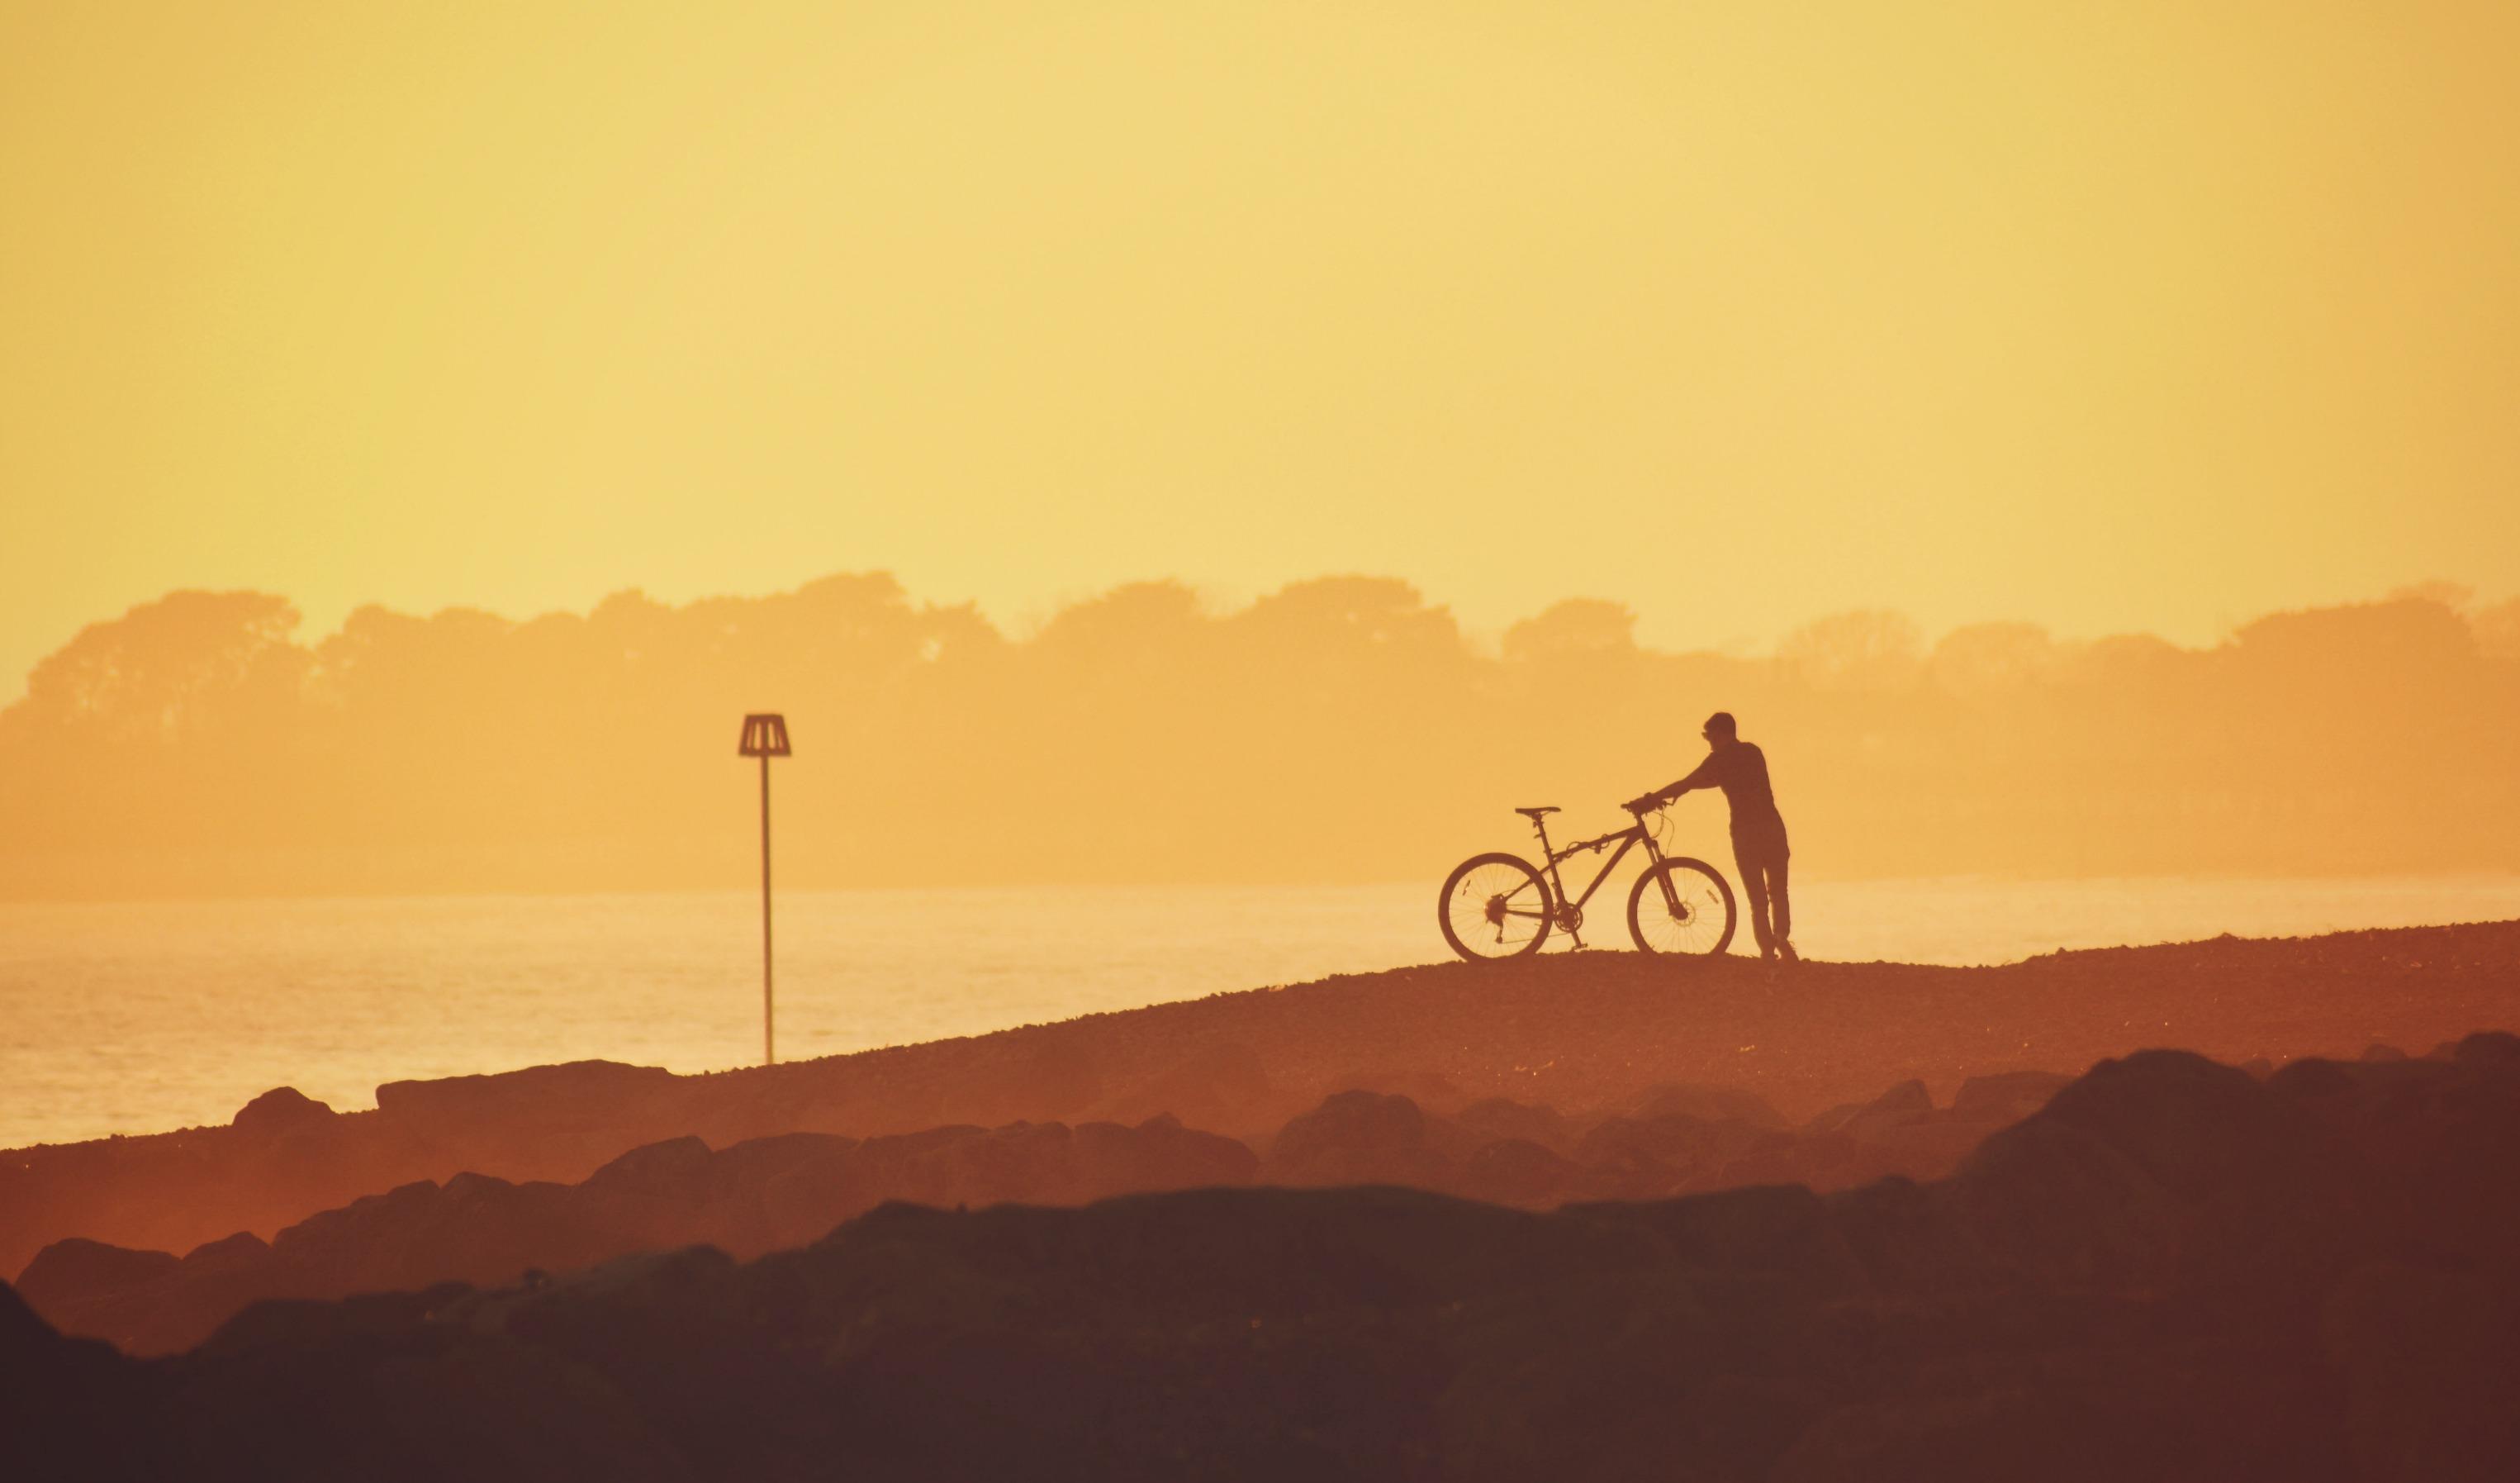 wallpaper : silhouette, sunset, evening, beach, coast, sea, rocks